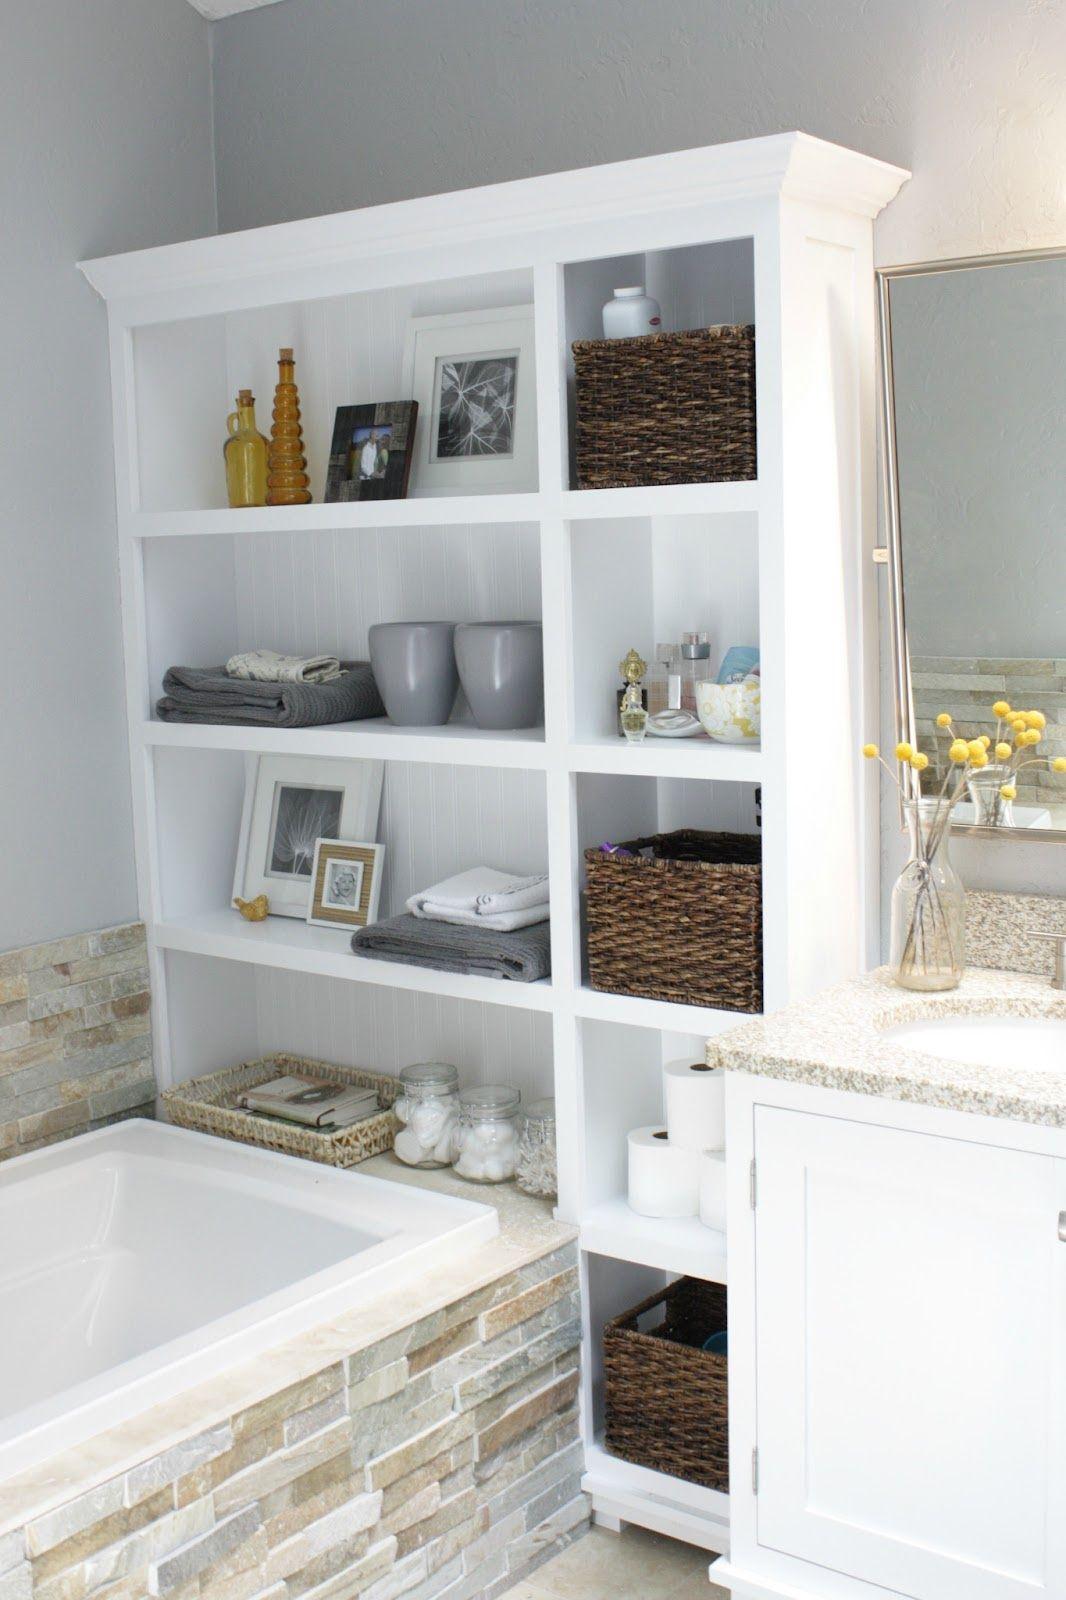 Bathroom, Amazing White Bathroom Storage: Awesome Bathroom Storage ...